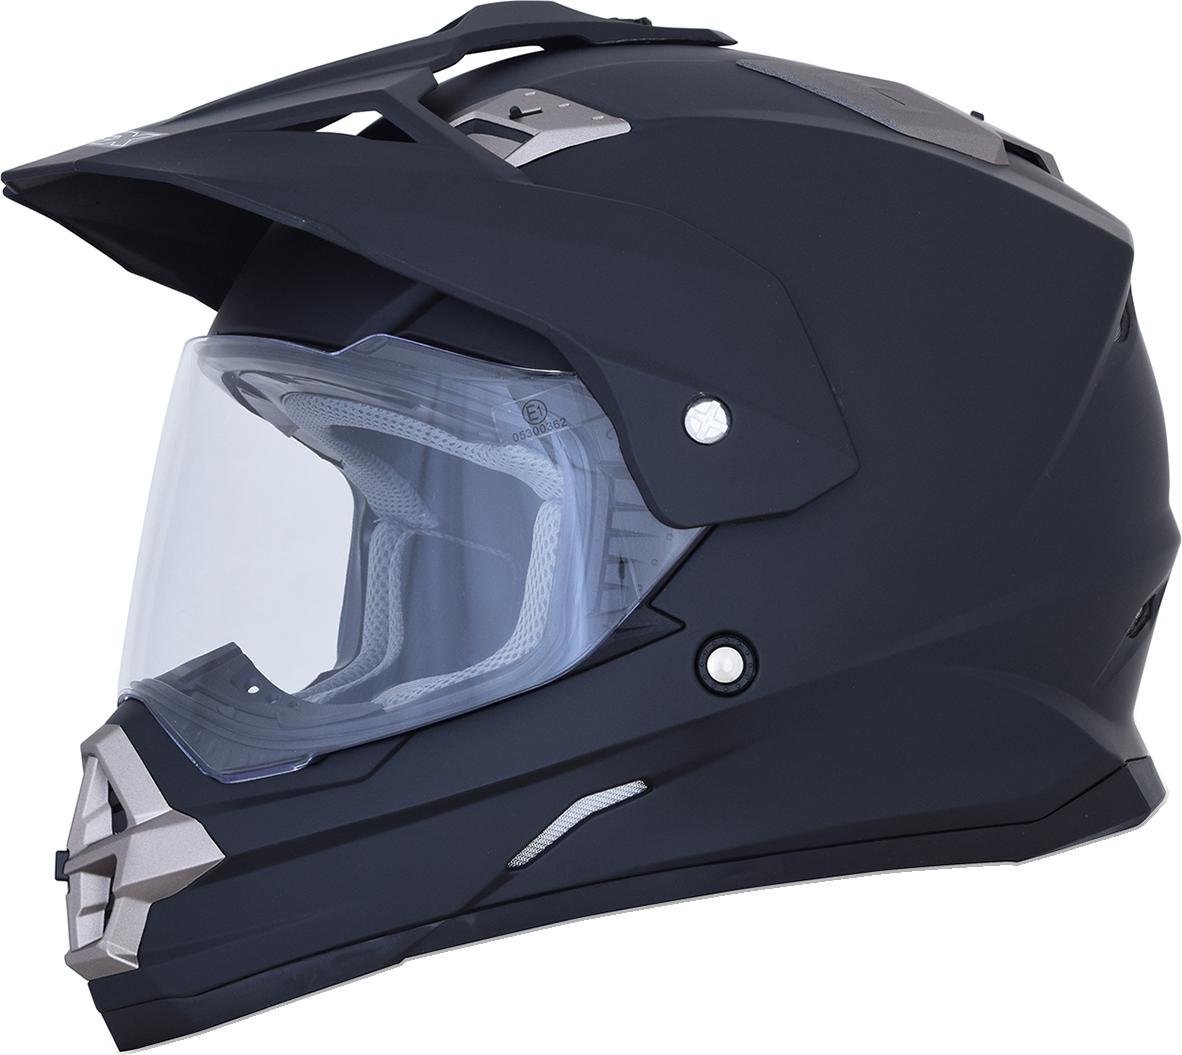 AFX FX-39 Dual Sport Series 2 Solid Helmet